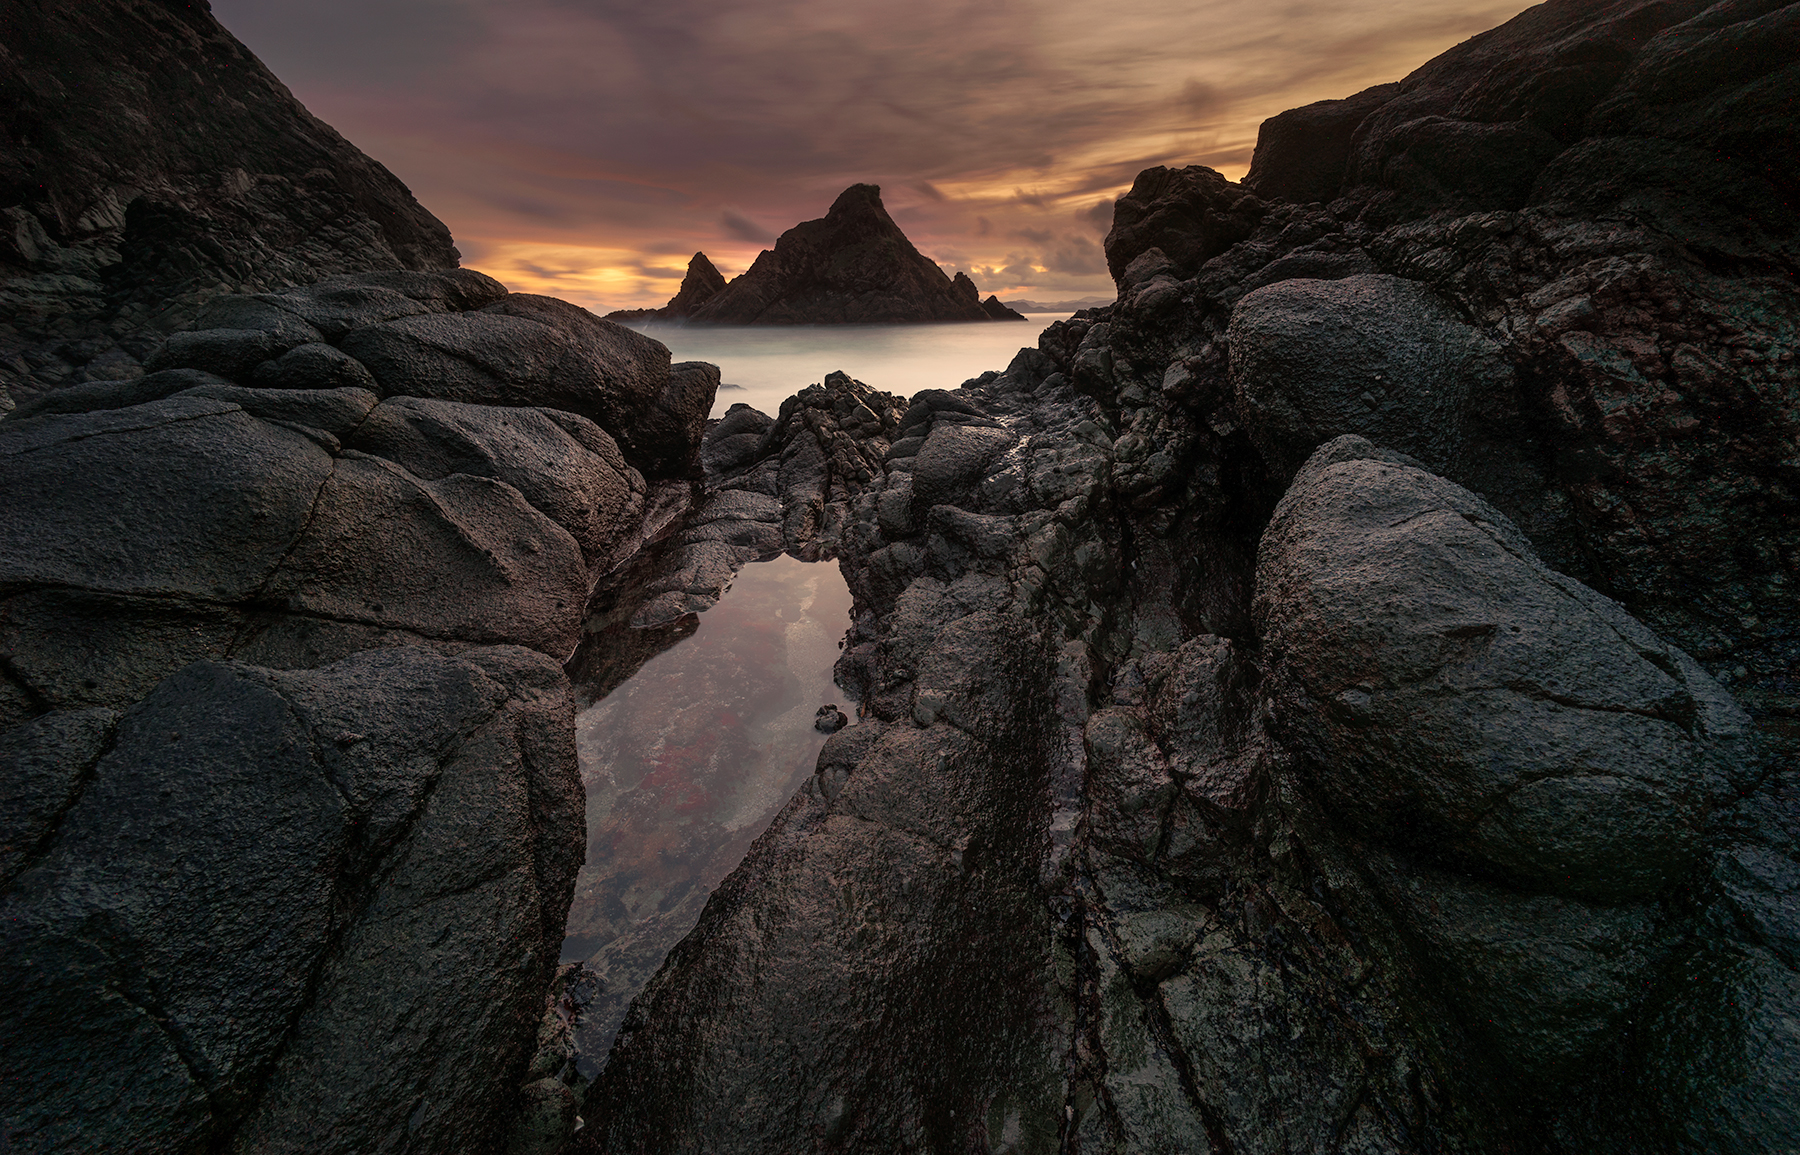 Telawas Rocks, Indonesia